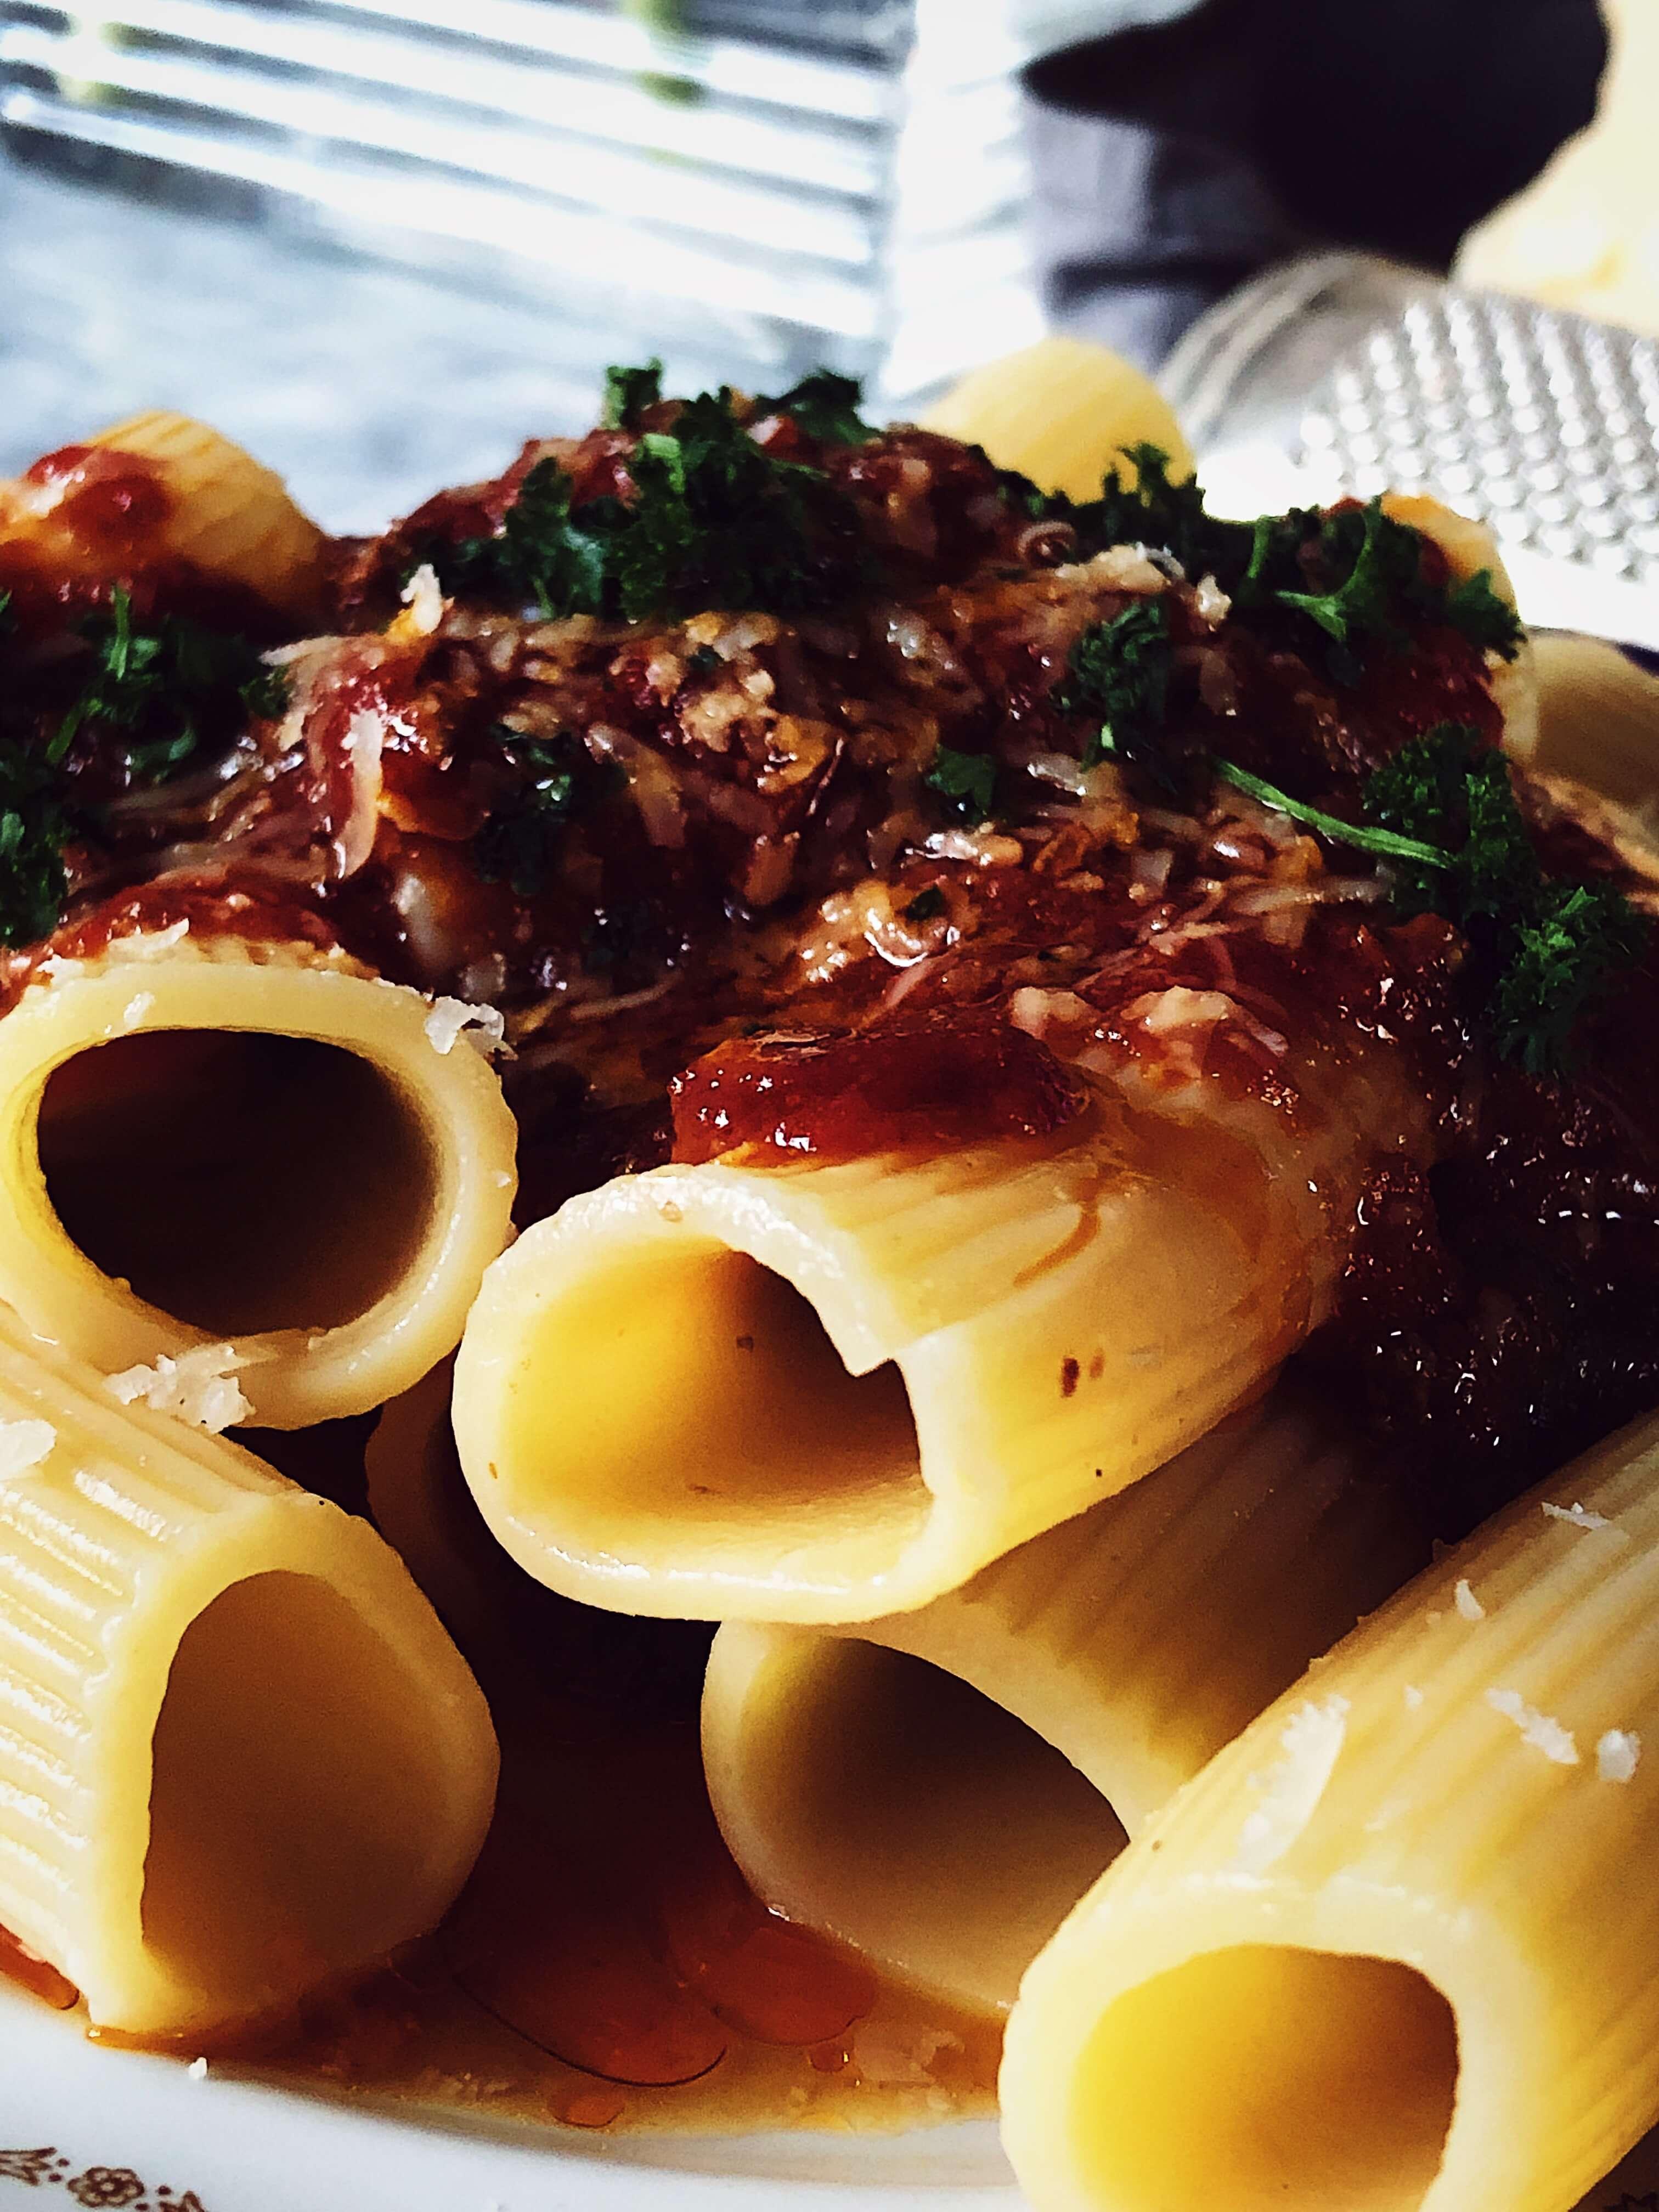 braciole sauce seasoned pasta